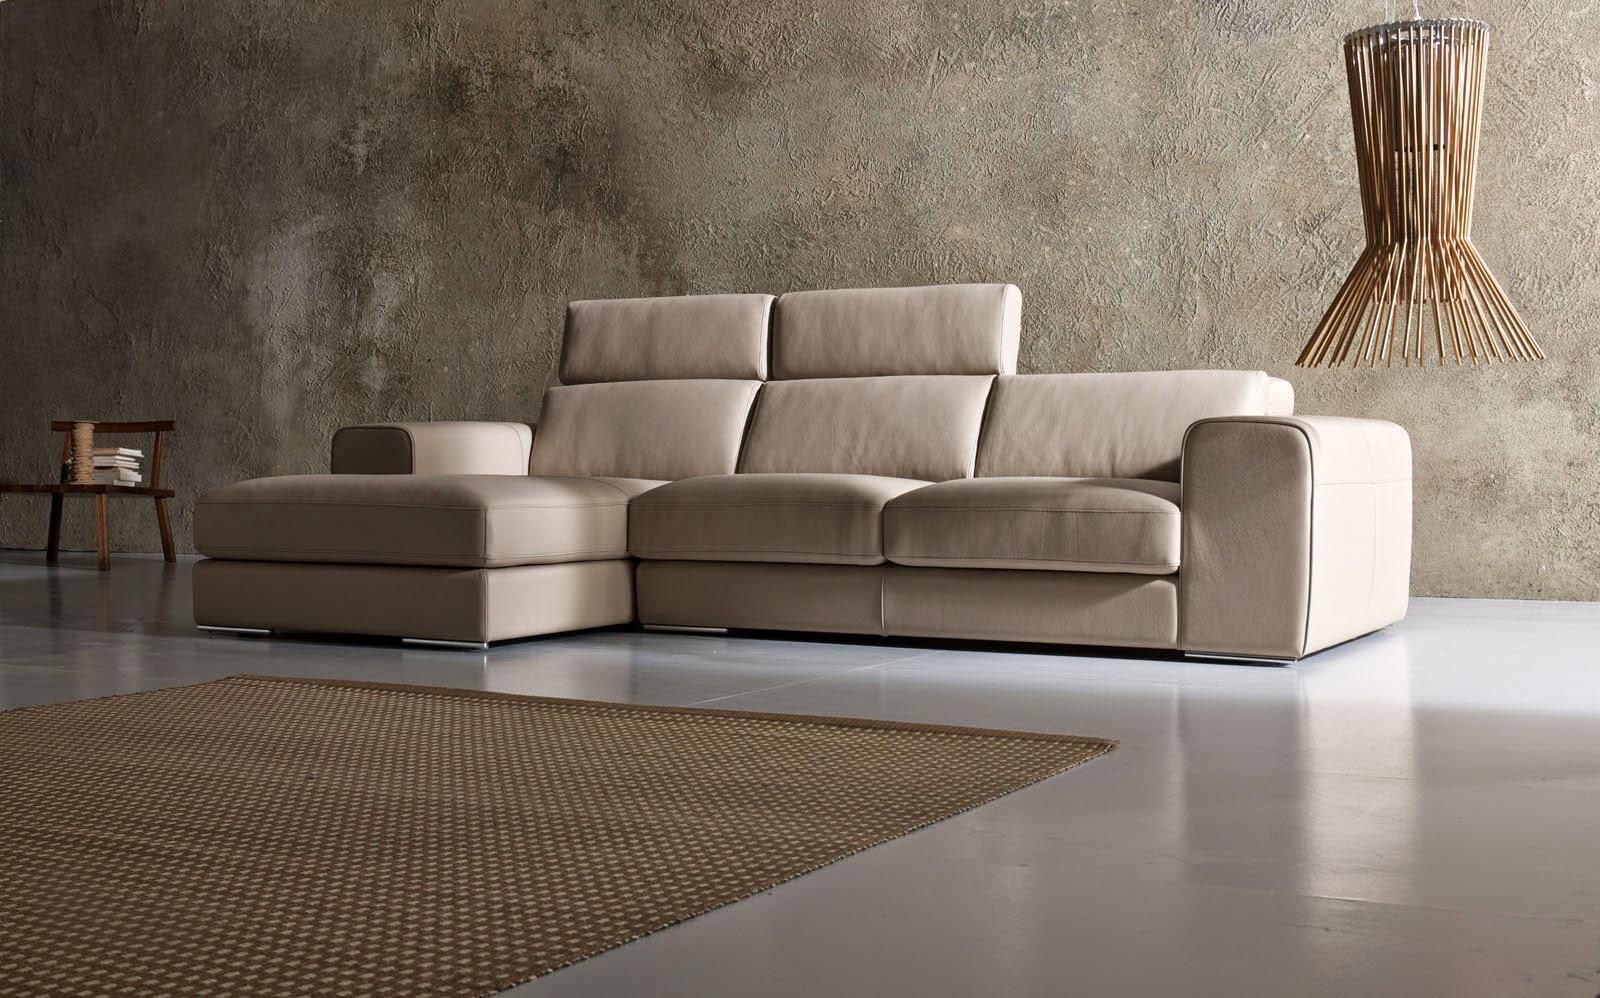 divani blog tino mariani divani relax elettrici e manuali